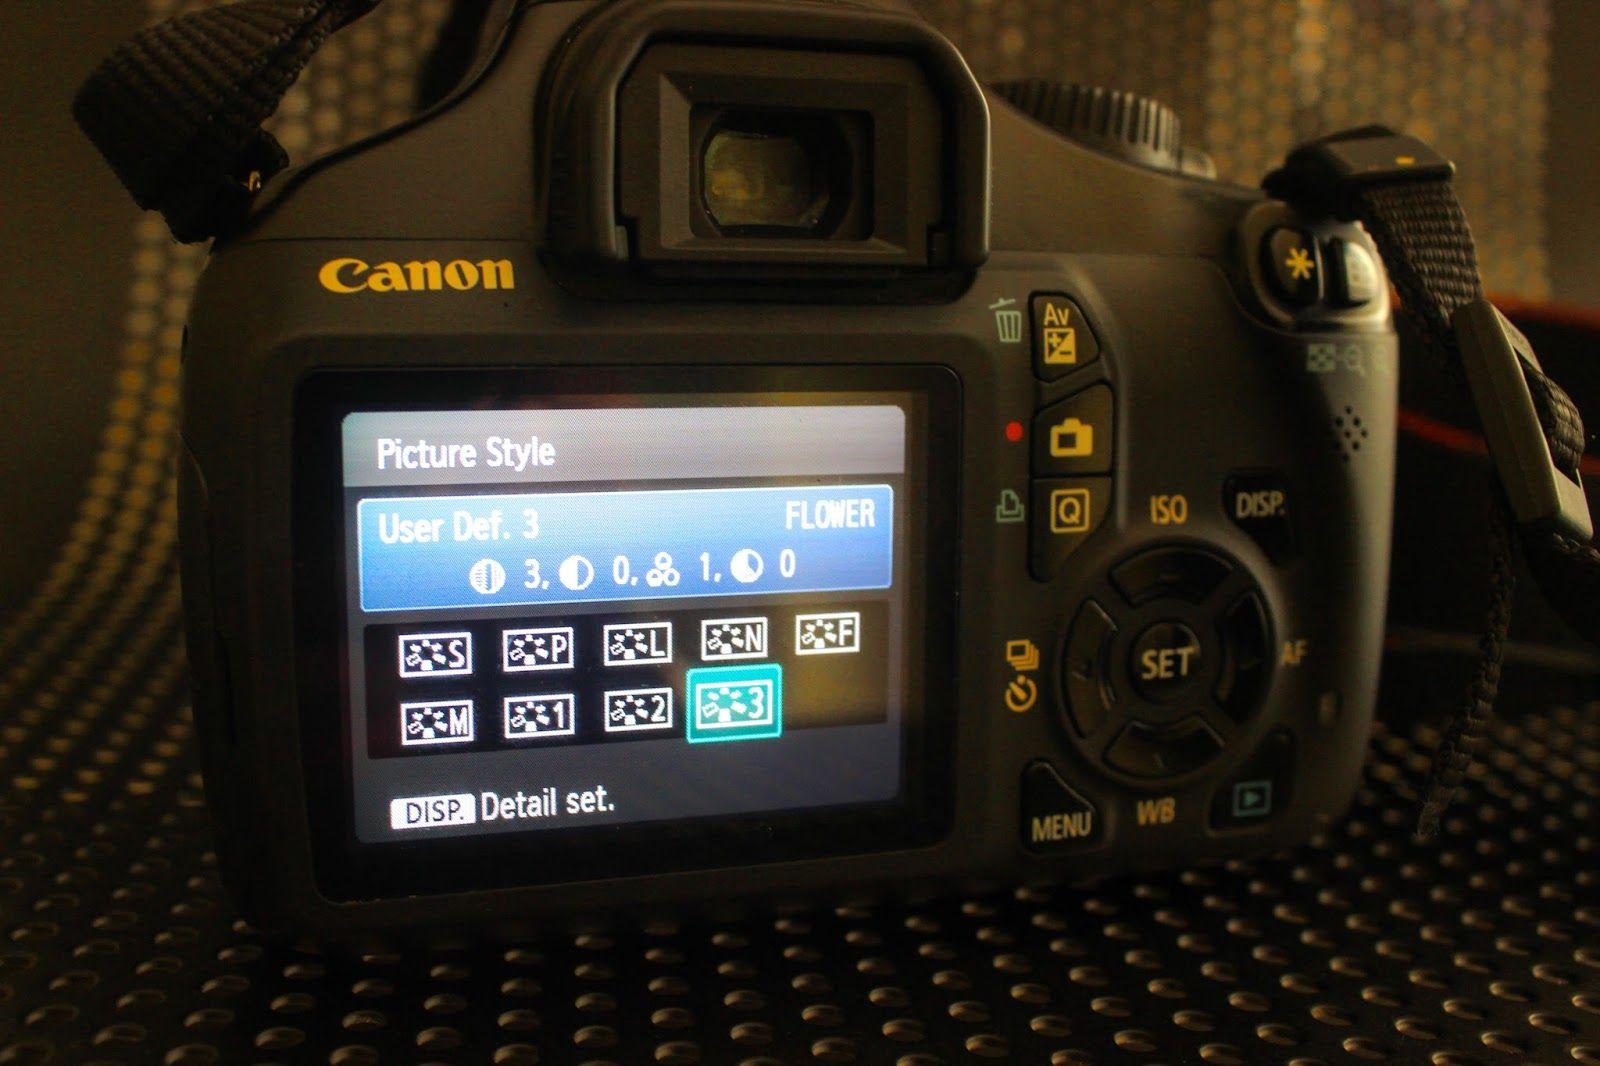 Cara Mengisi Picture Style Pada Kamera Dslr Canon Kamera Dslr Kamera